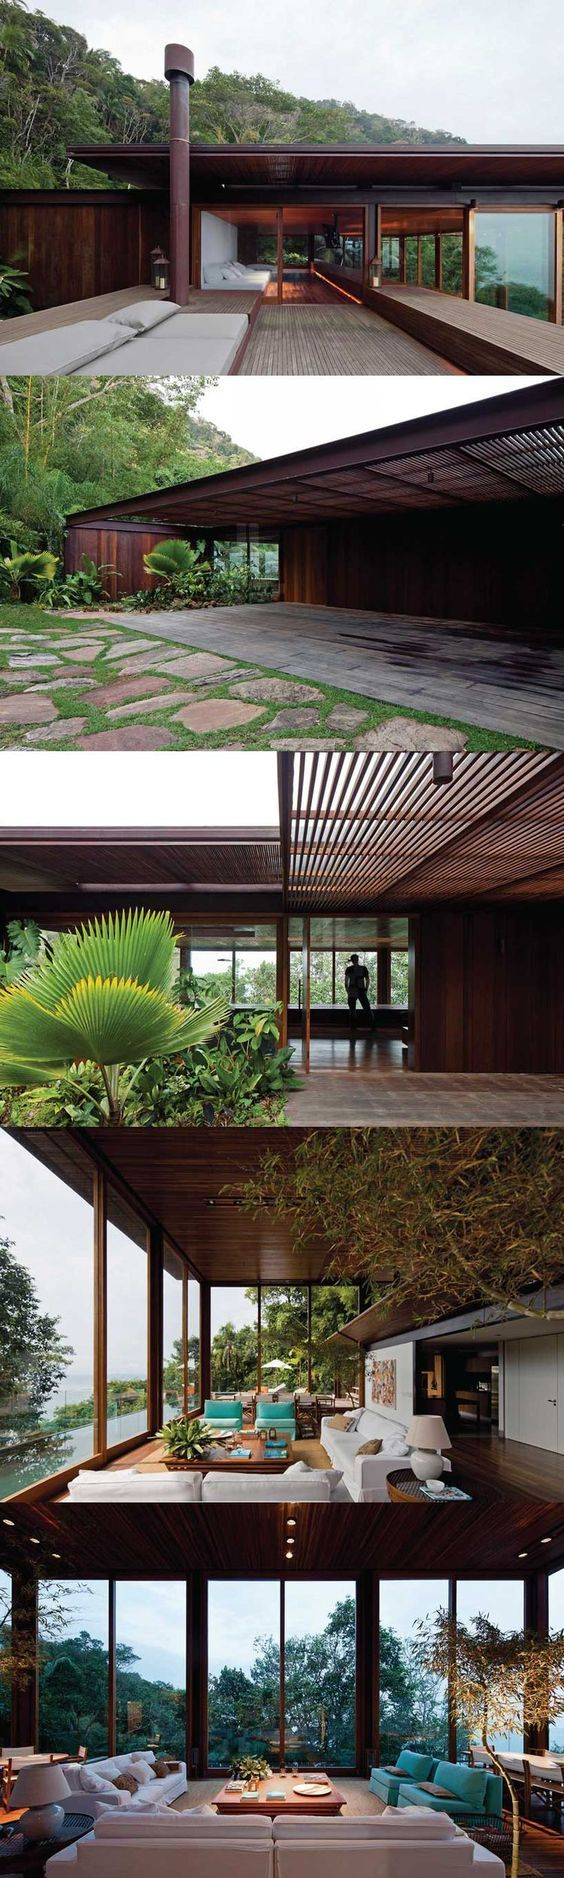 best projet maison en bois images on pinterest homes tiny